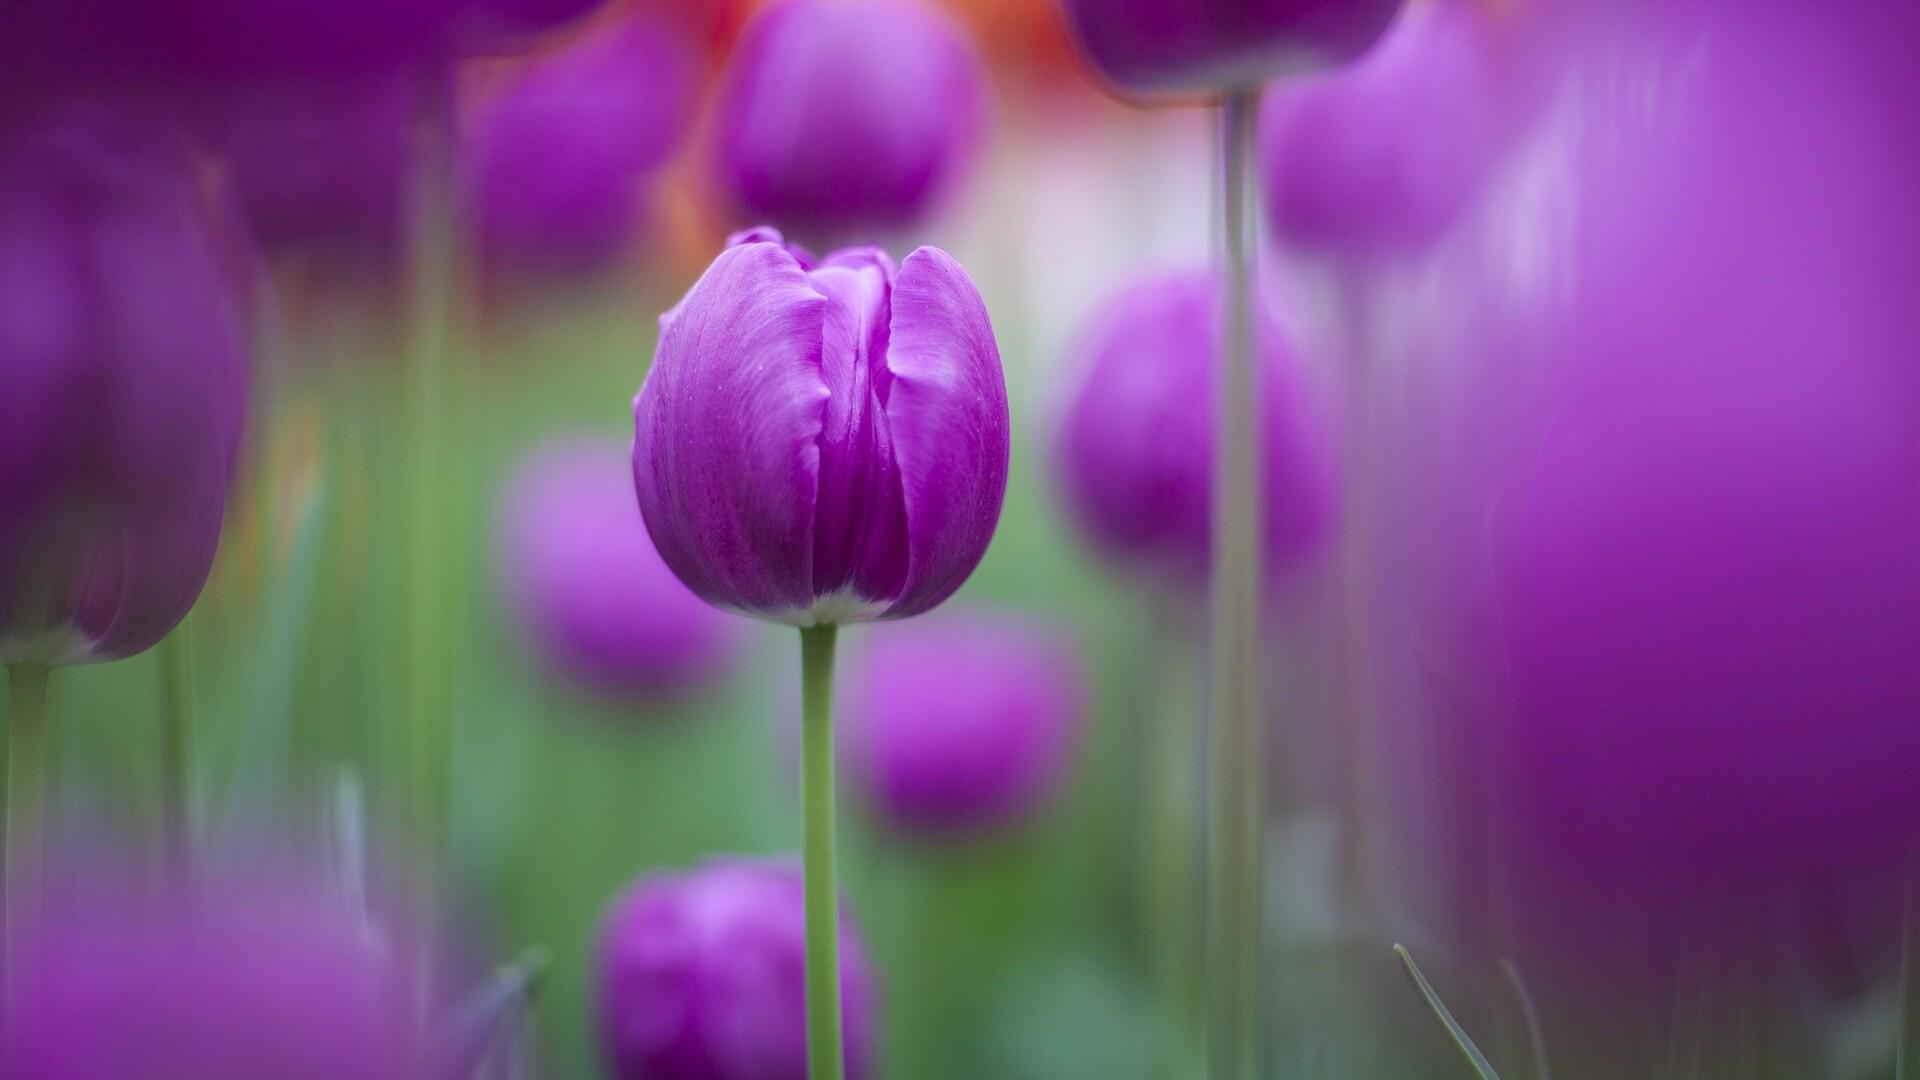 1920x1080 Purple Colour Tulips Laptop Full Hd 1080p Hd 4k Wallpapers